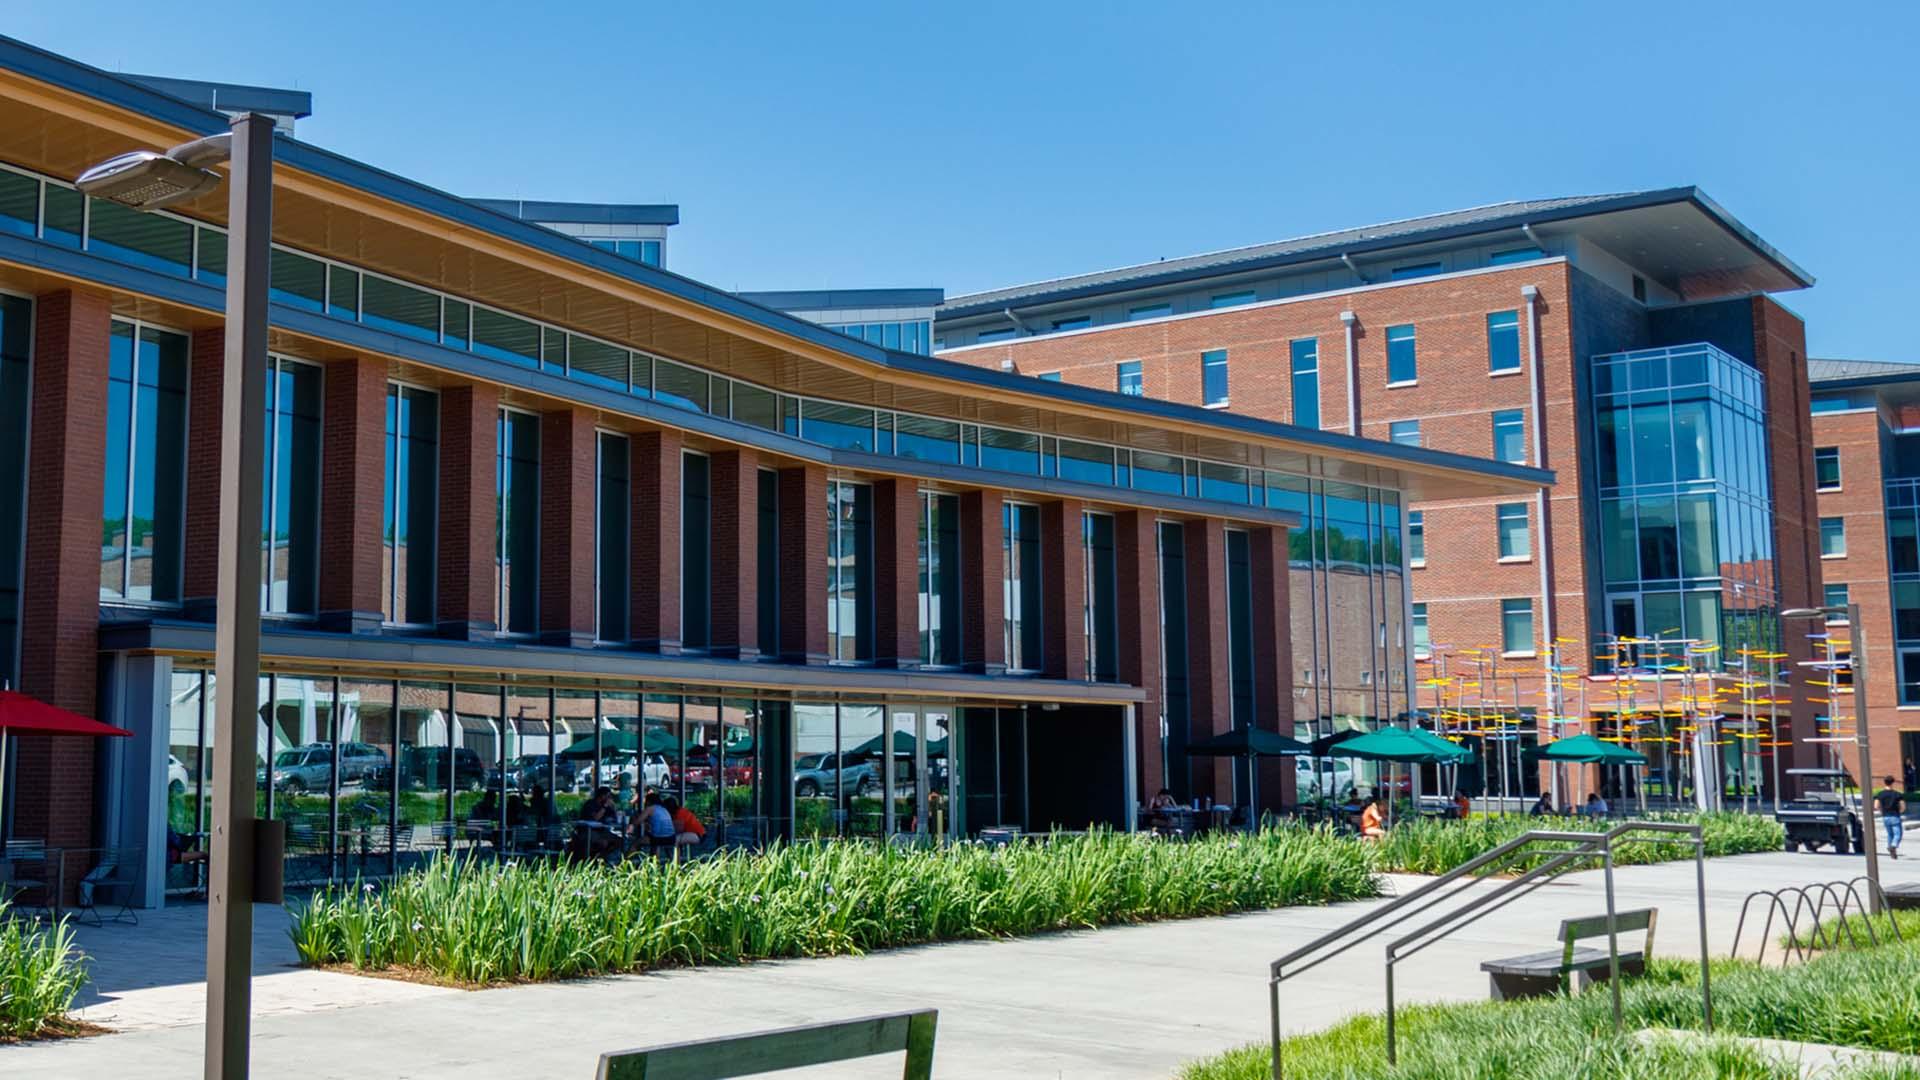 Photo of Clemson University building